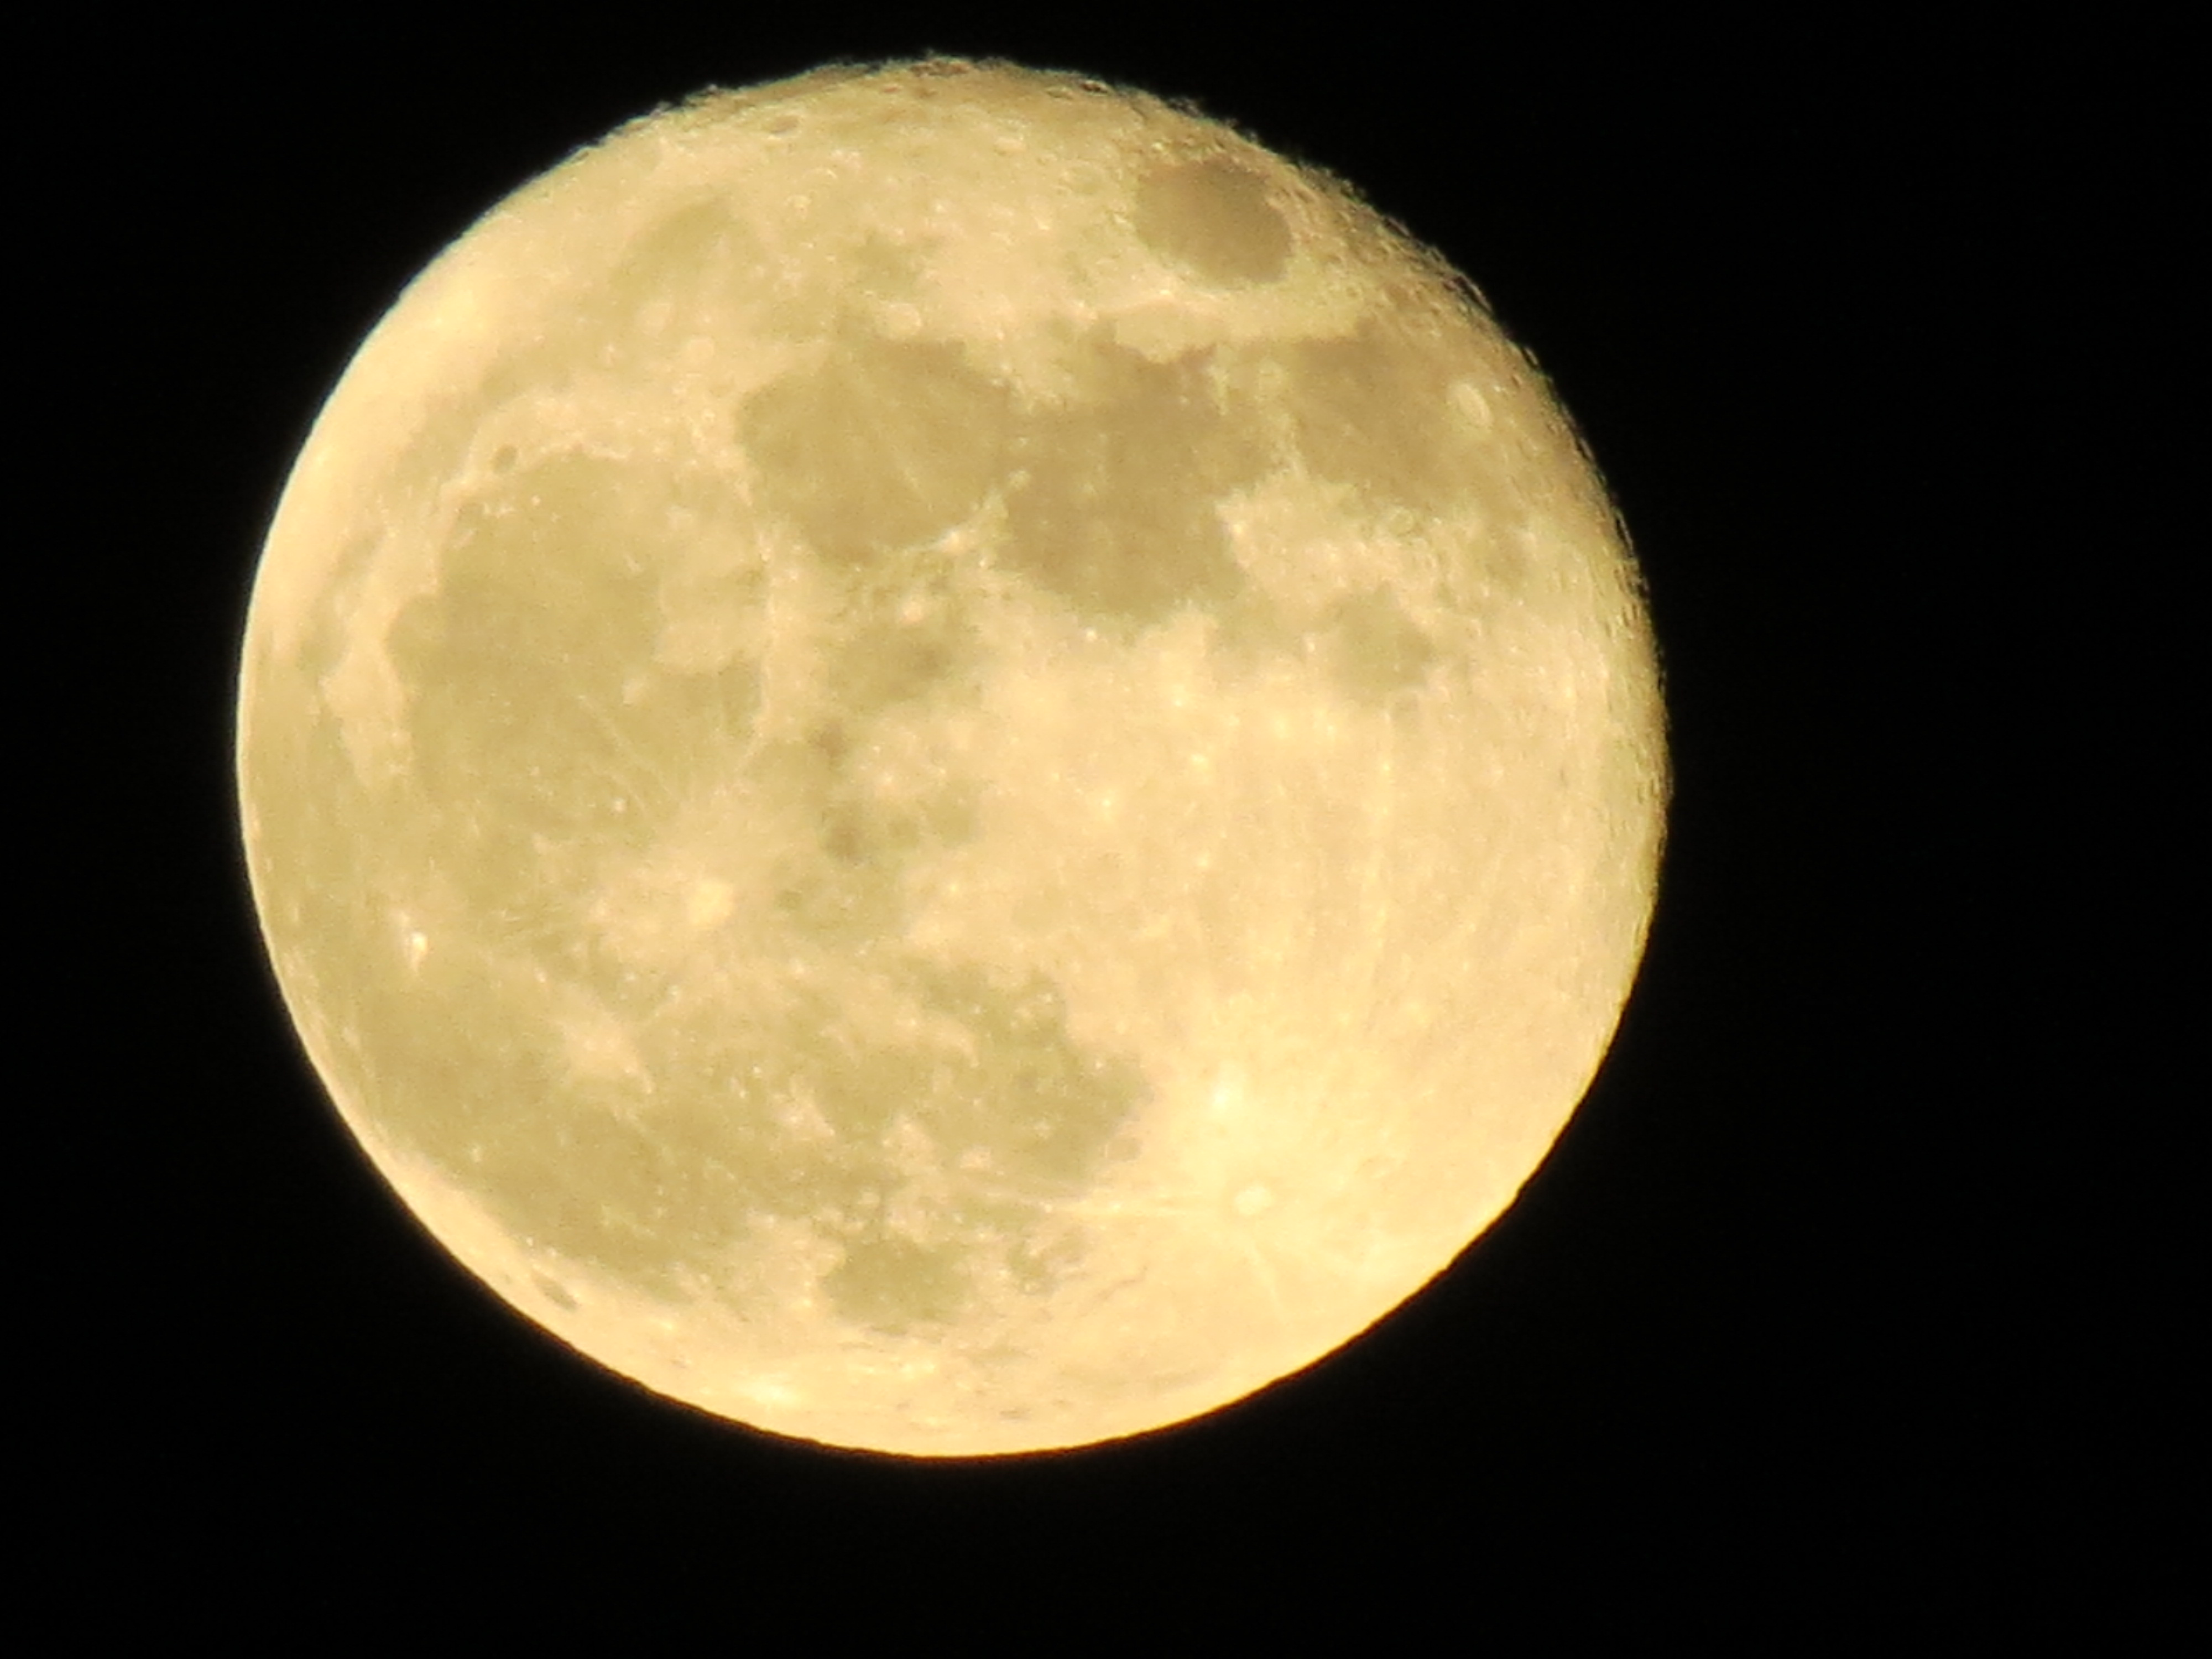 full moon mon nov 19 2013 012 tammy goldammer